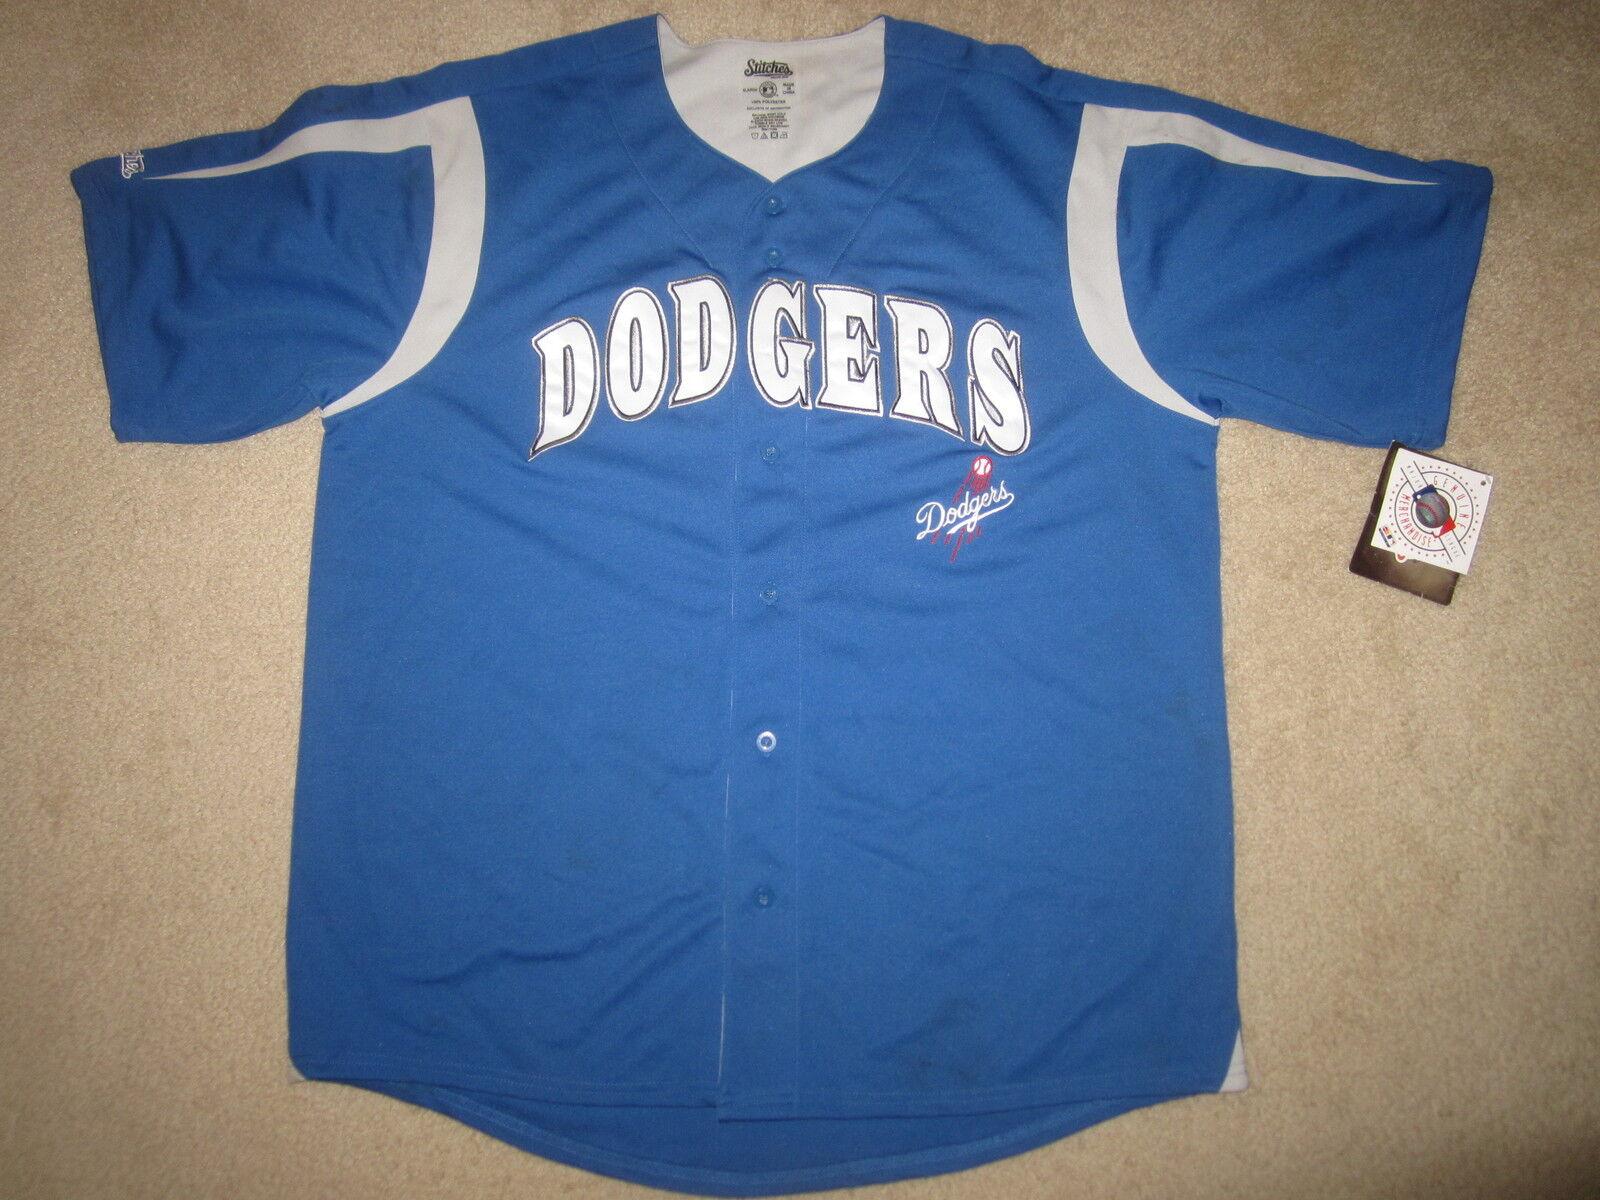 Los Angeles La Dodgers MLB Baseballtrikot XL Neu Neu Neu Herren 7f5b0d